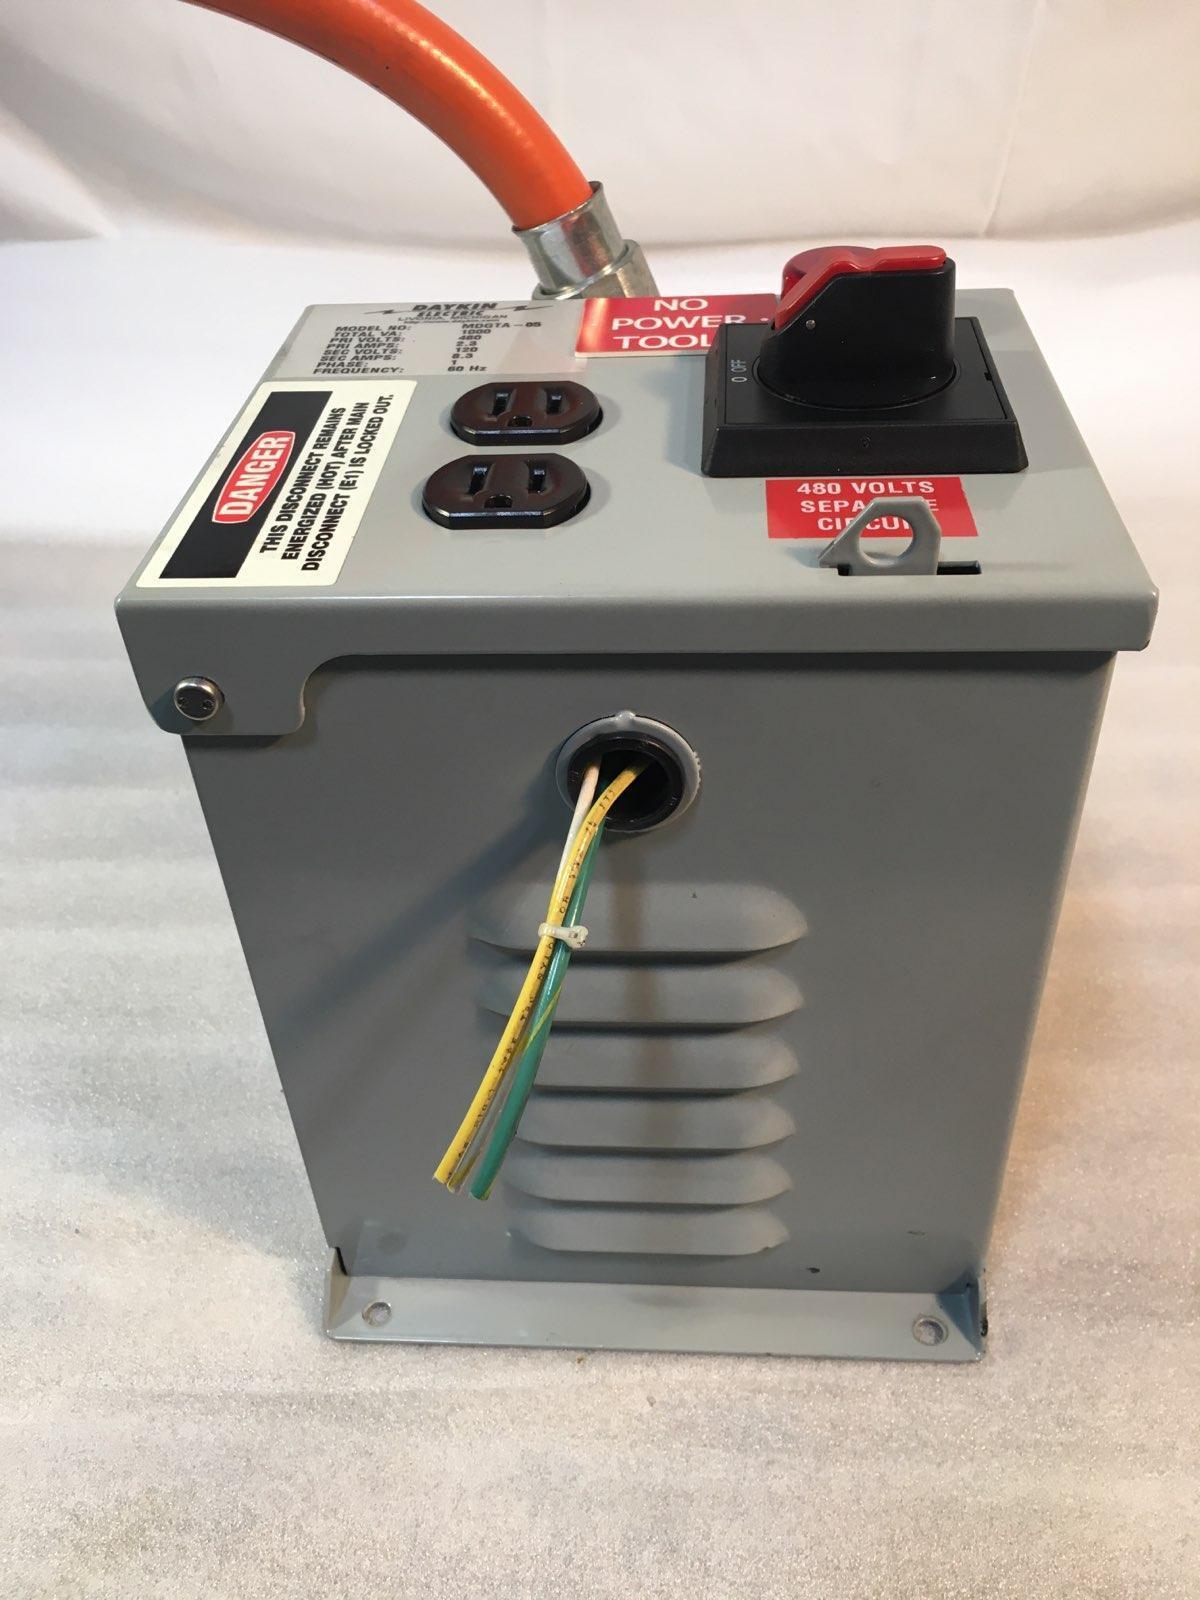 DAYKIN ELECTRIC MDGTA-05 Transformer Disconnect, Total VA-1000, Pri Volts 480, Sec Volts 120.